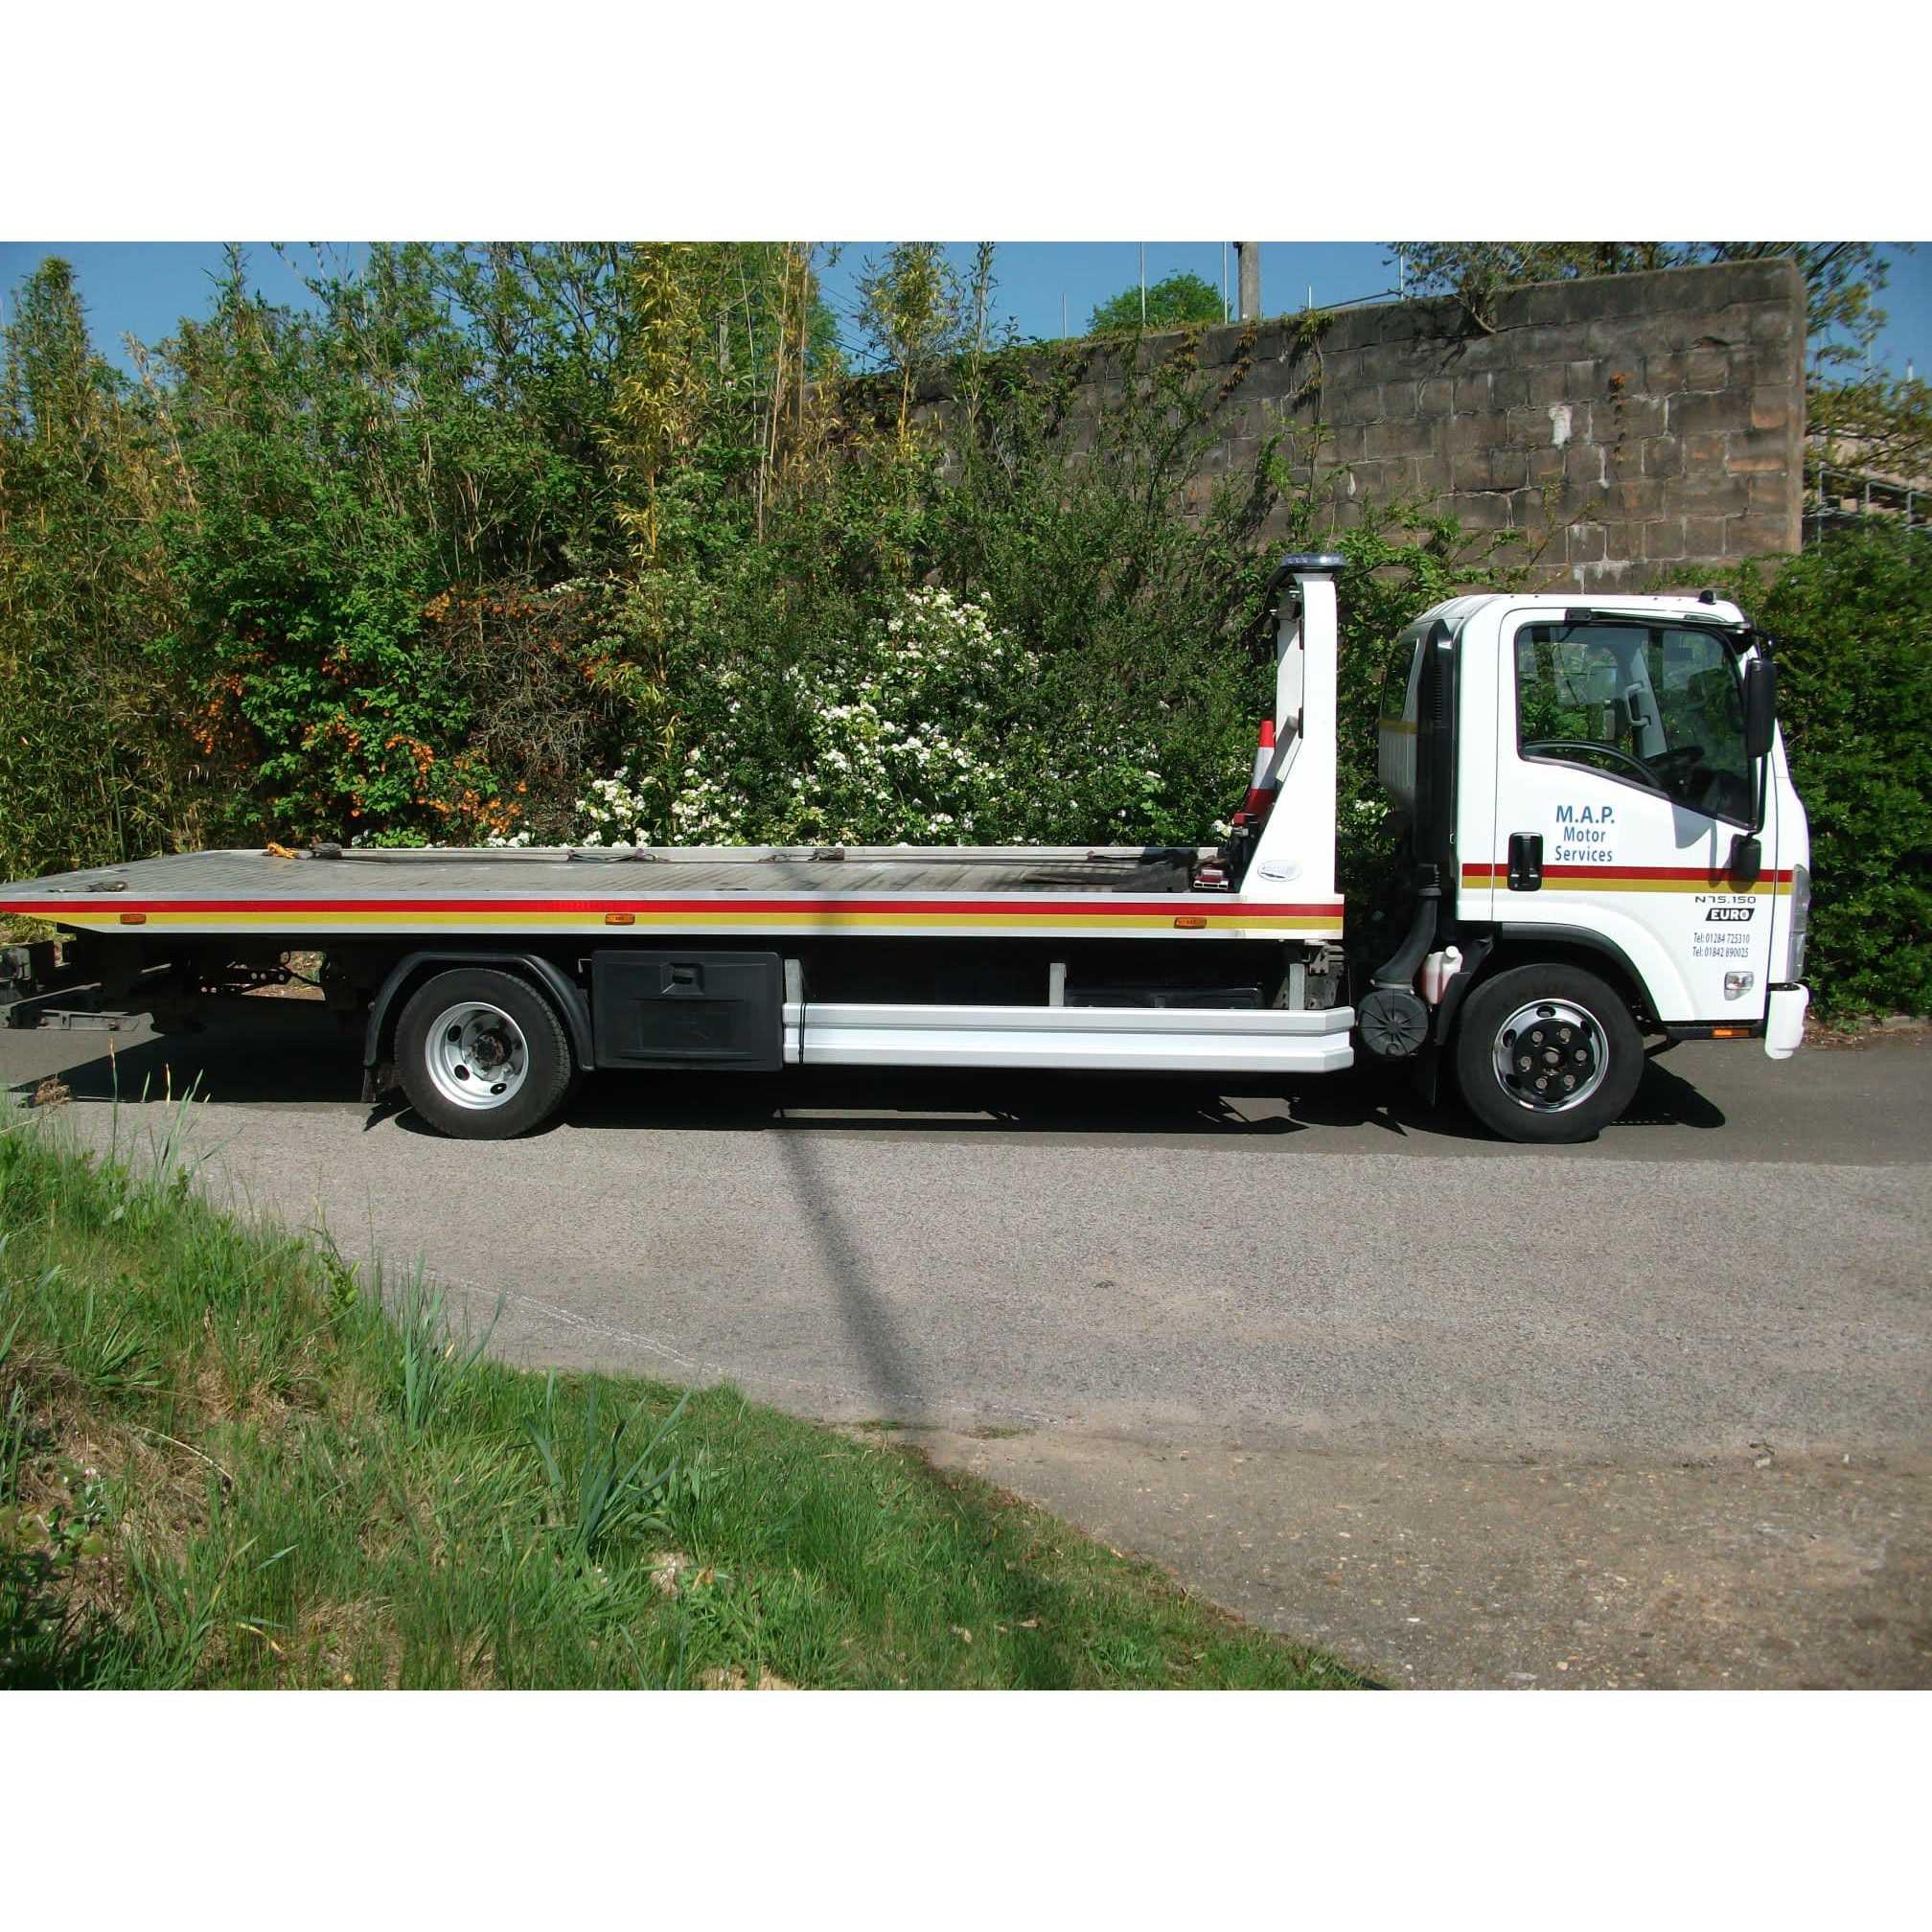 M.A.P Recovery Services - Thetford, Essex IP24 2PH - 01842 890025 | ShowMeLocal.com